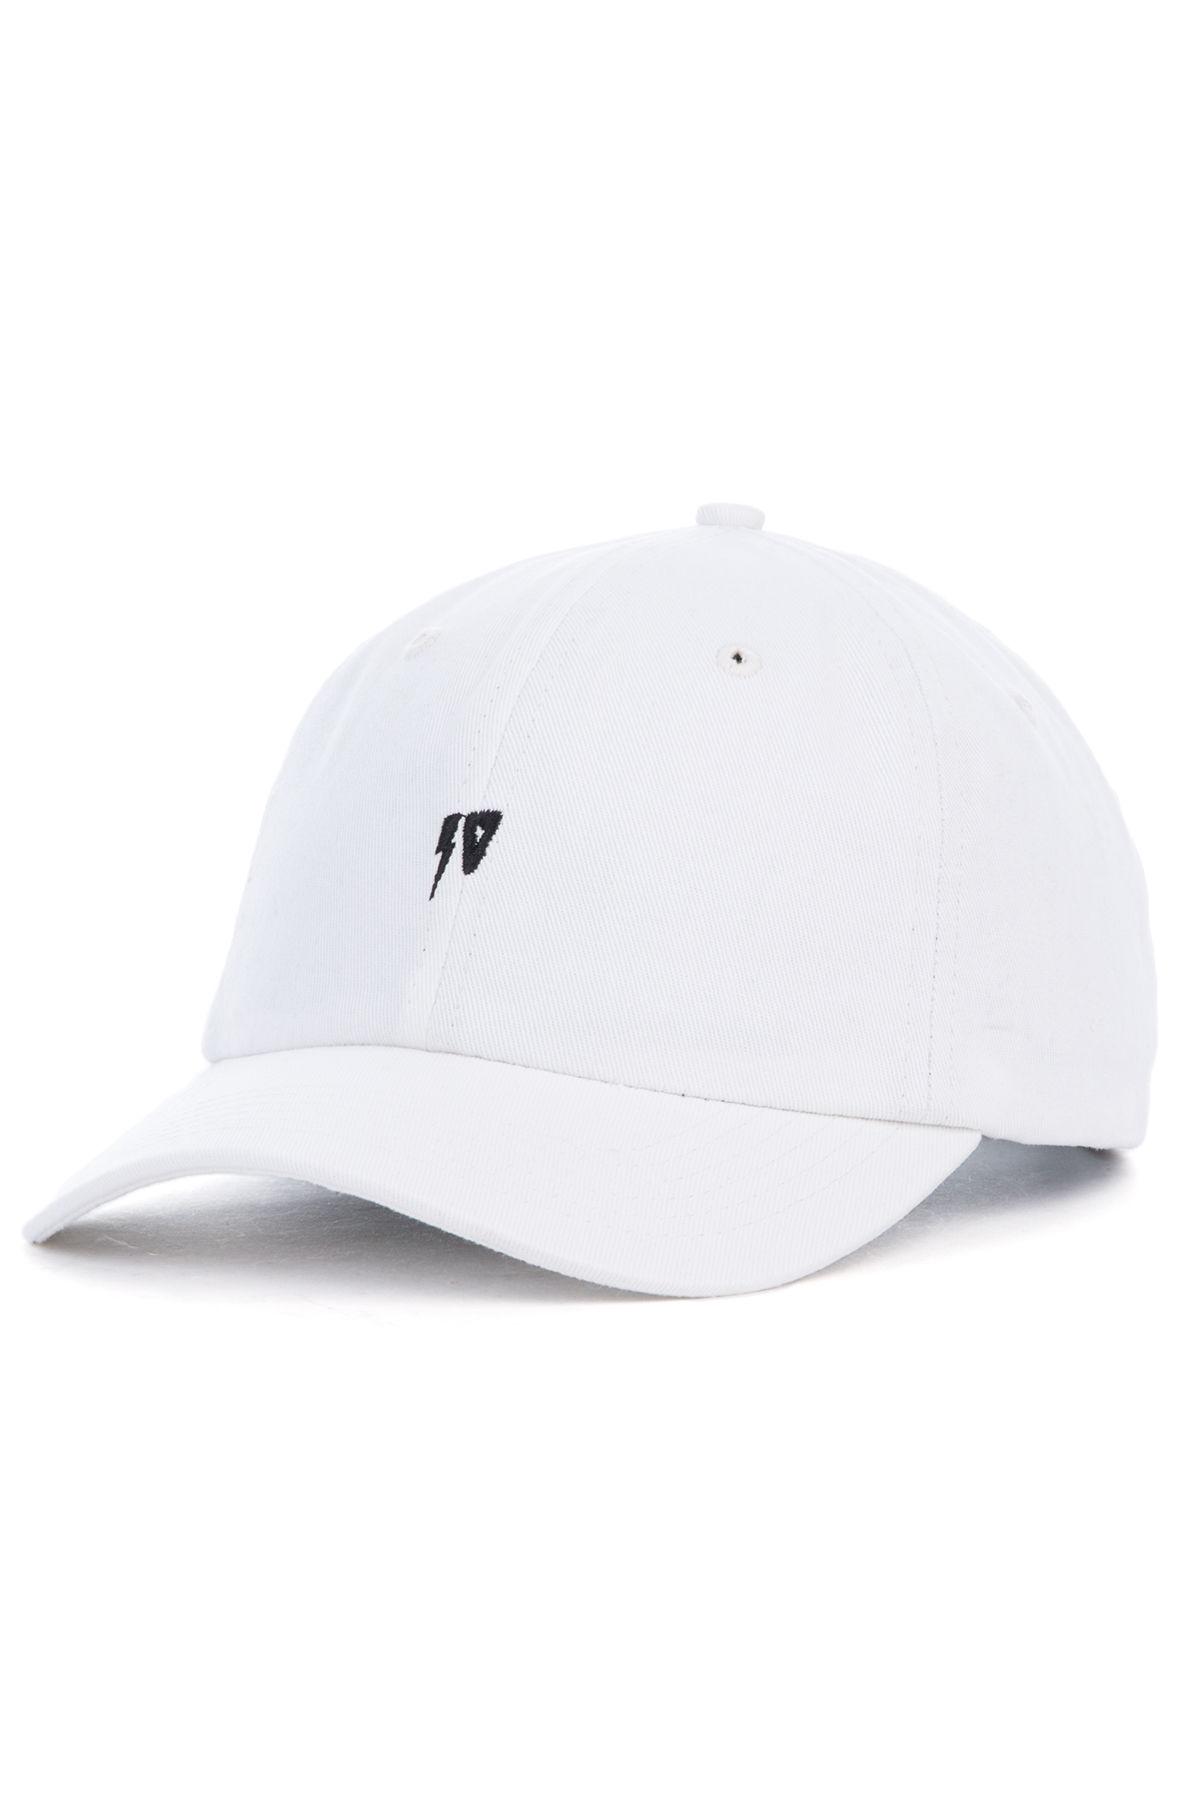 10 Deep Hat 10 Strikes Snapback White 3a18840dd1b7